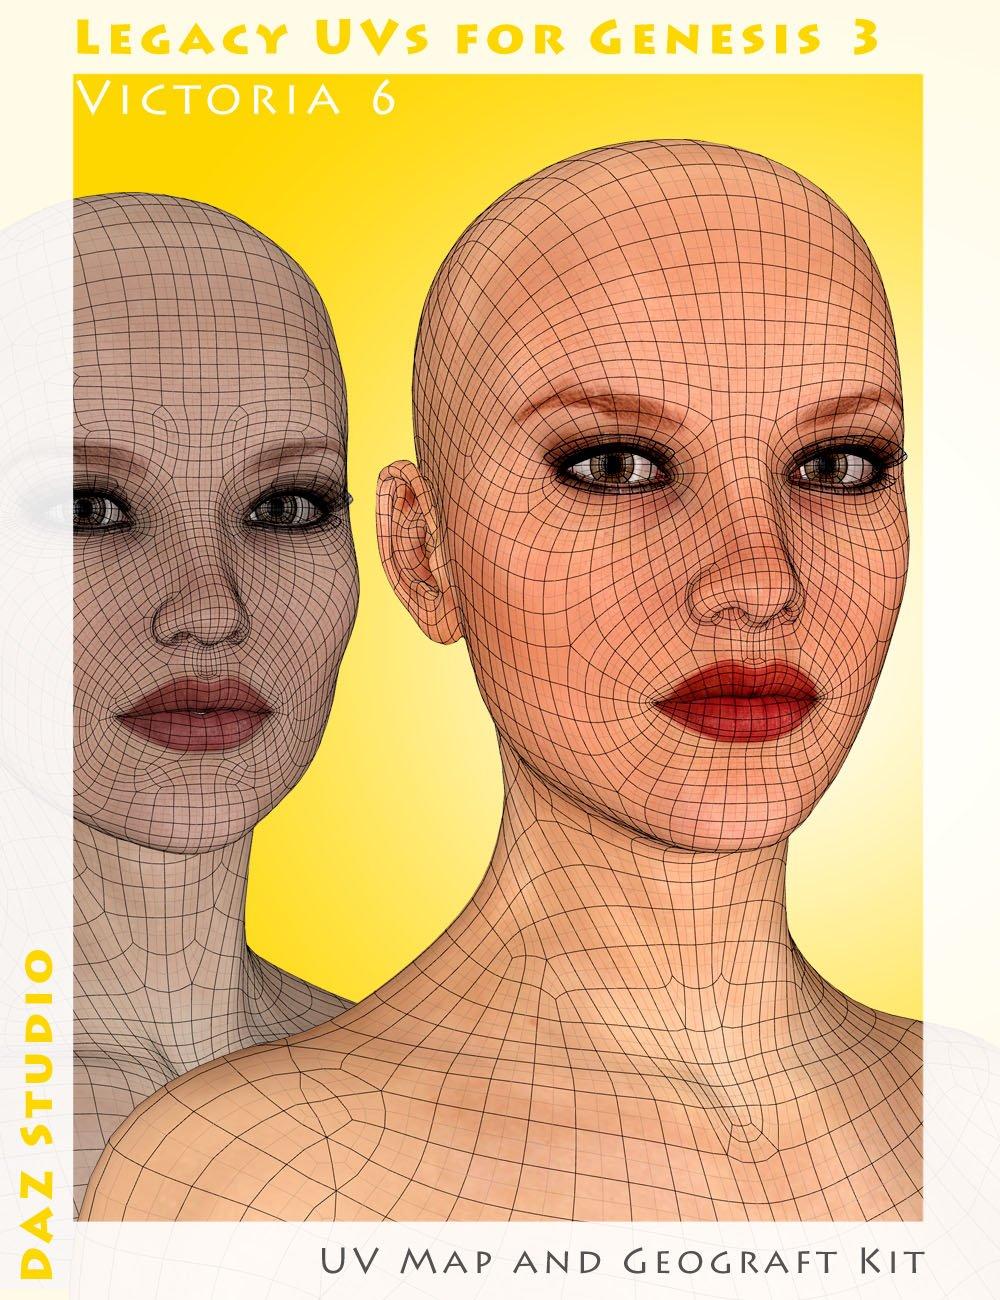 Legacy UVs for Genesis 3: Victoria 6 by: Cayman Studios, 3D Models by Daz 3D